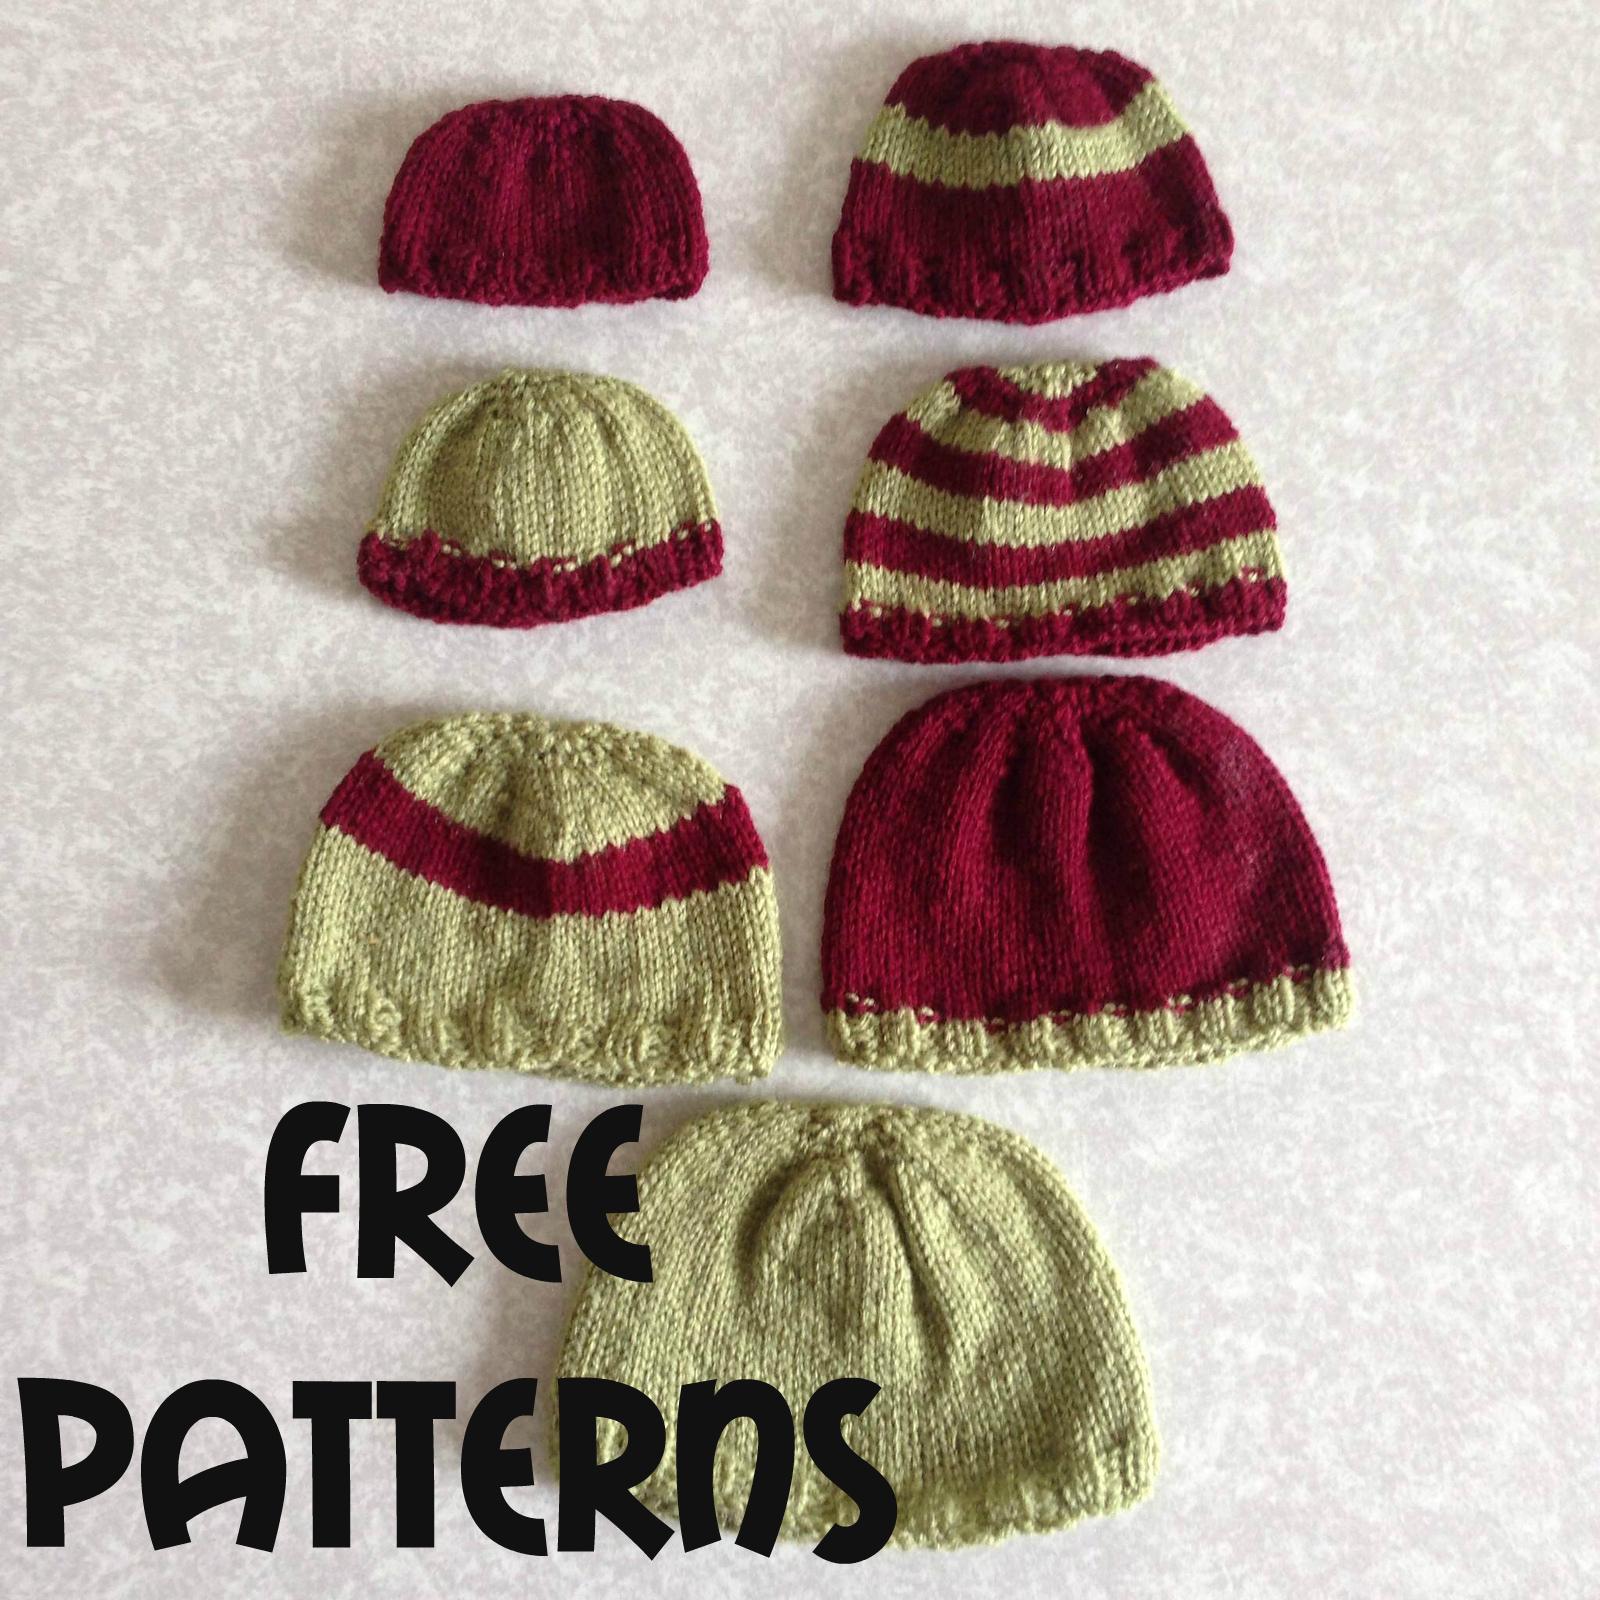 free-patterns.jpg